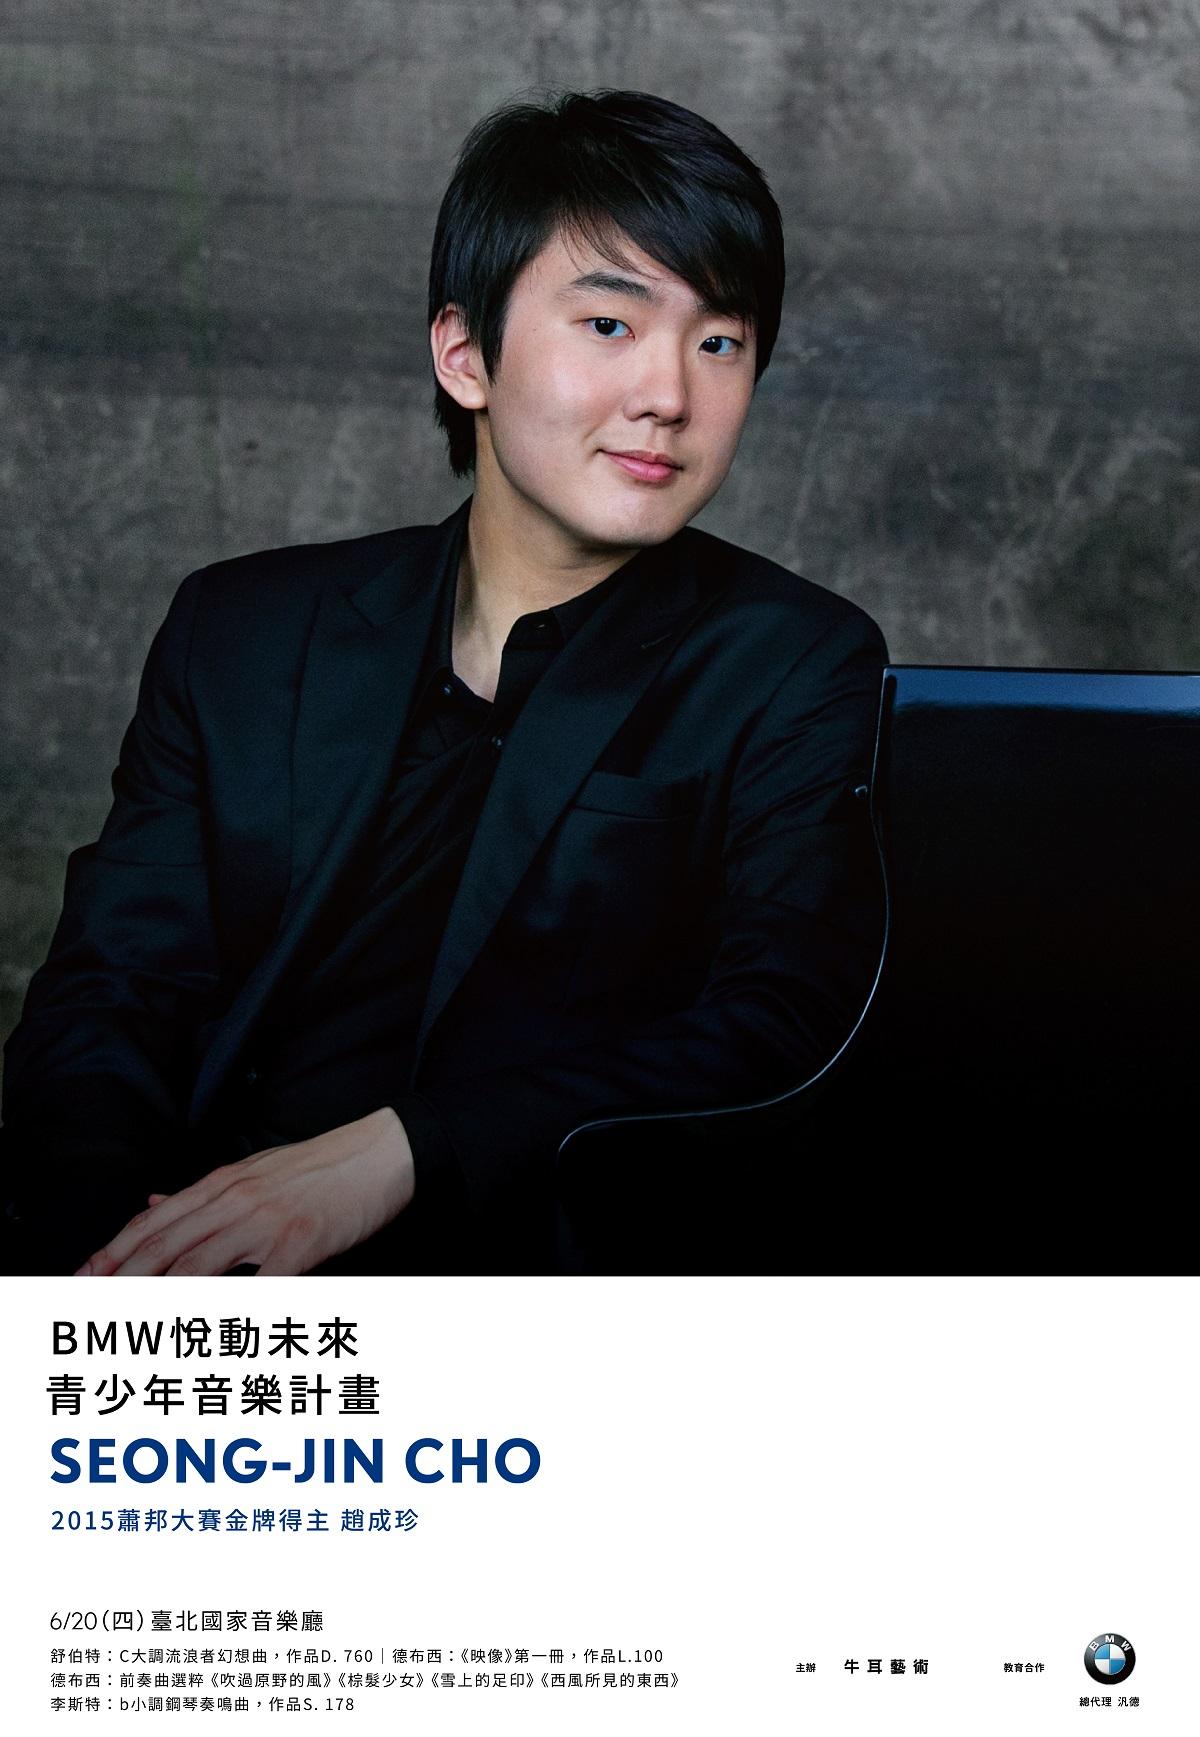 BMW悅動未來青少年音樂計畫-趙成珍音樂會.JPG